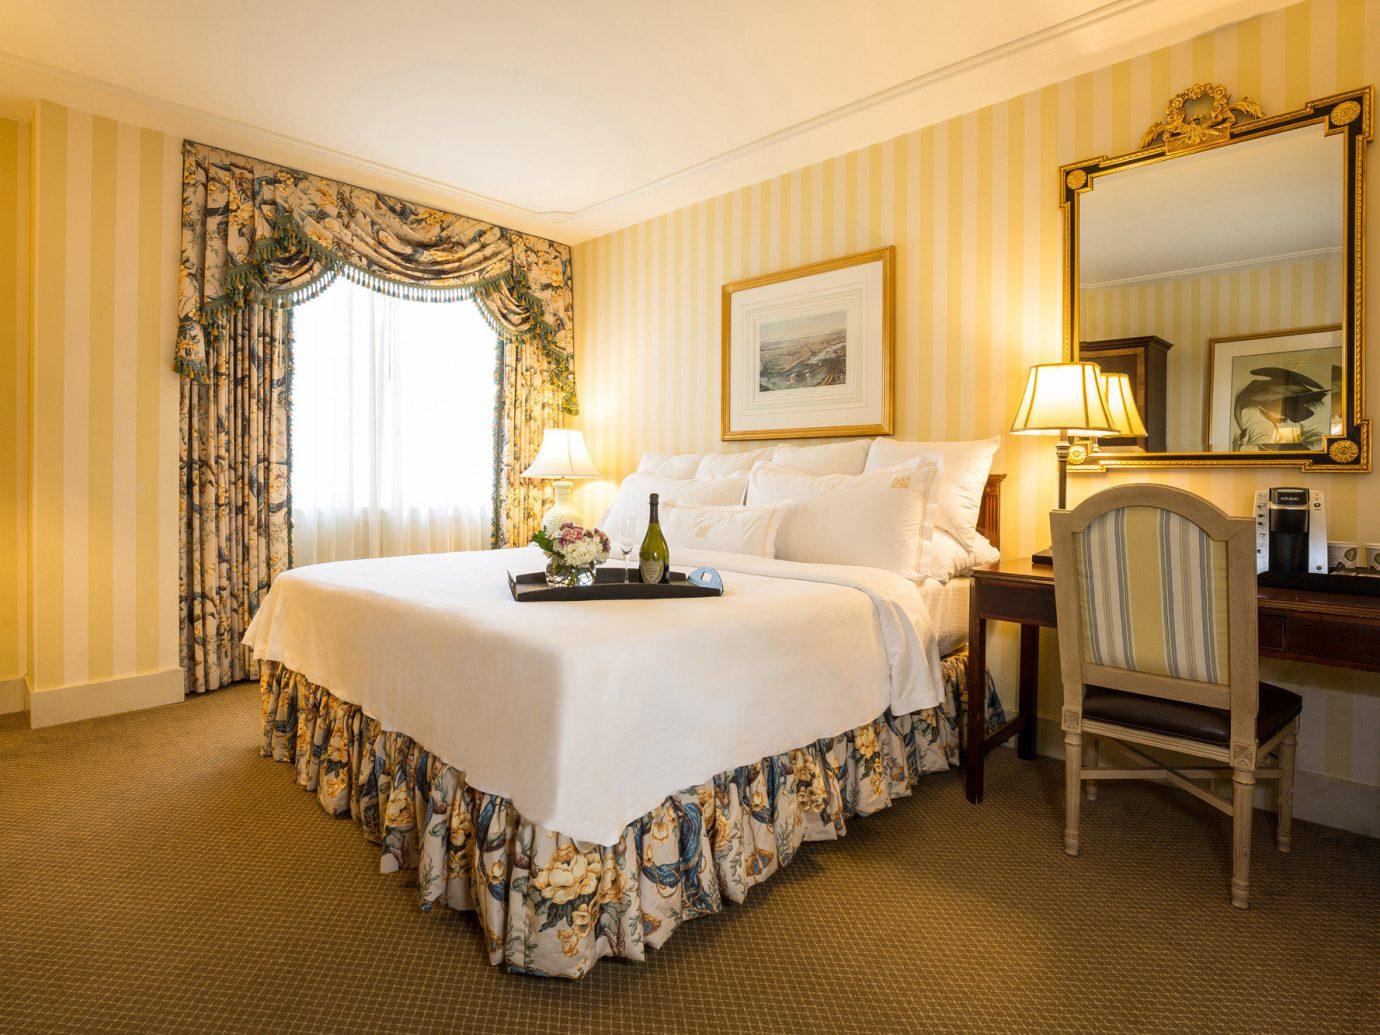 Hotels floor indoor wall room Suite bed ceiling interior design scene Bedroom hotel real estate furniture estate window